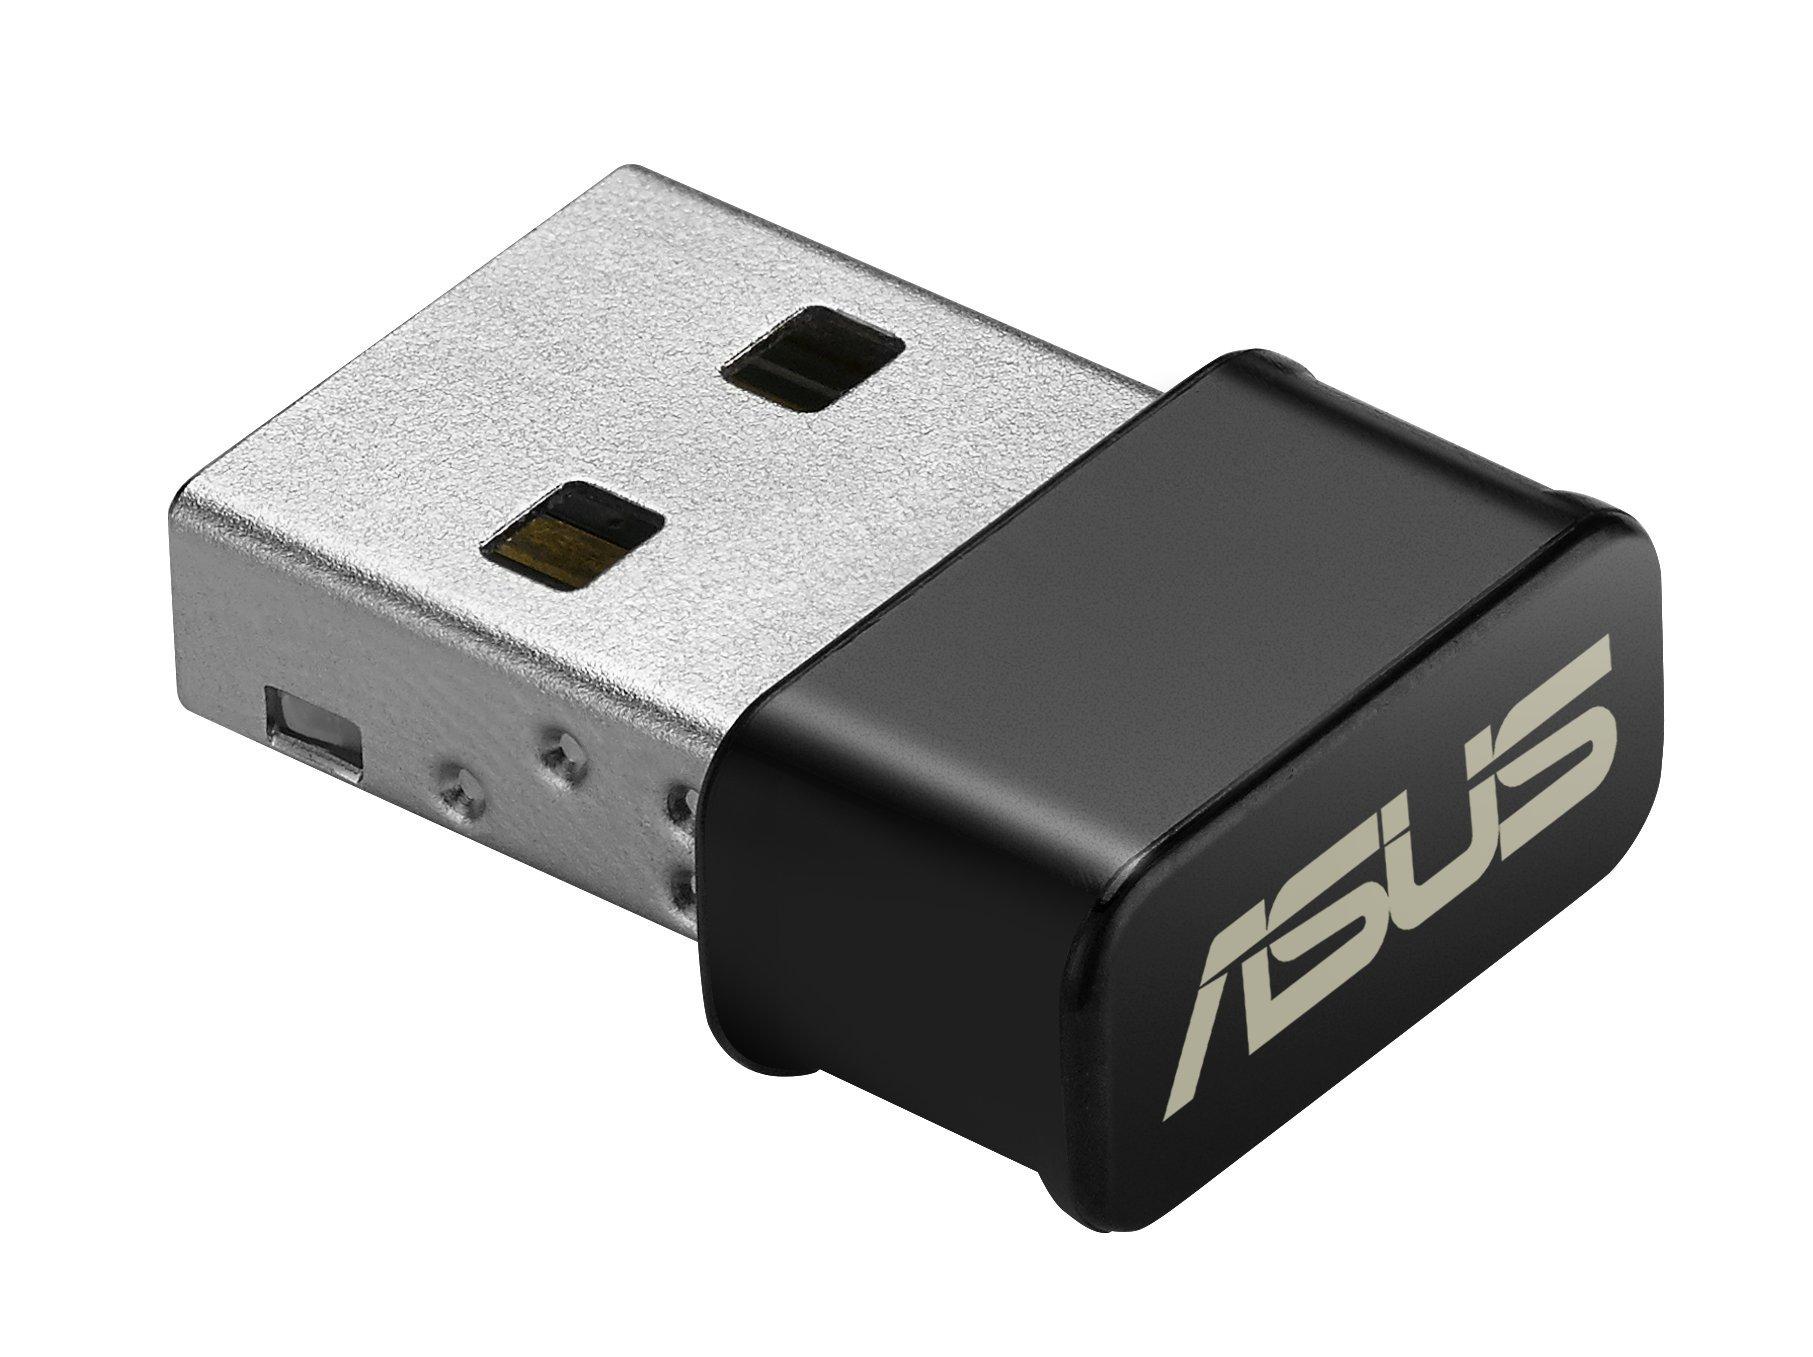 Asus USB-AC53 Nano WLAN Wi-Fi USB Networking Adapter